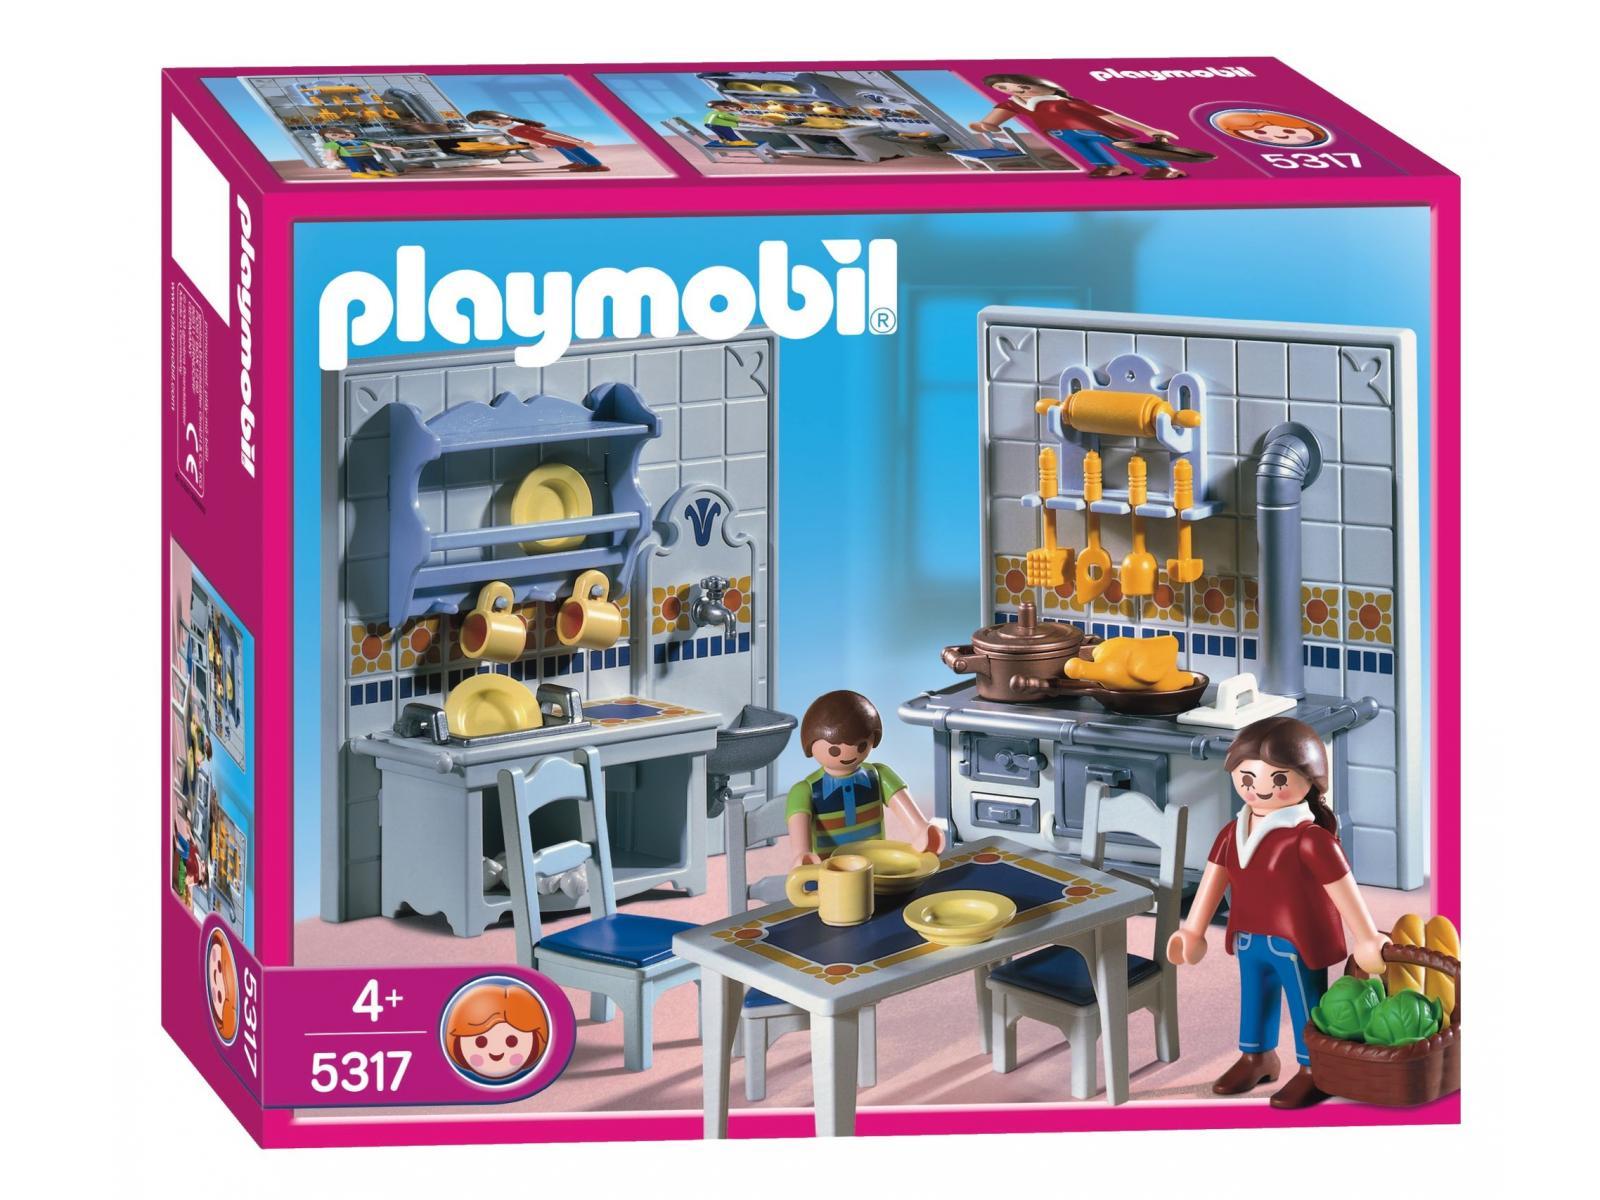 Interieur maison playmobil 2018 maison moderne for Playmobil maison moderne cuisine